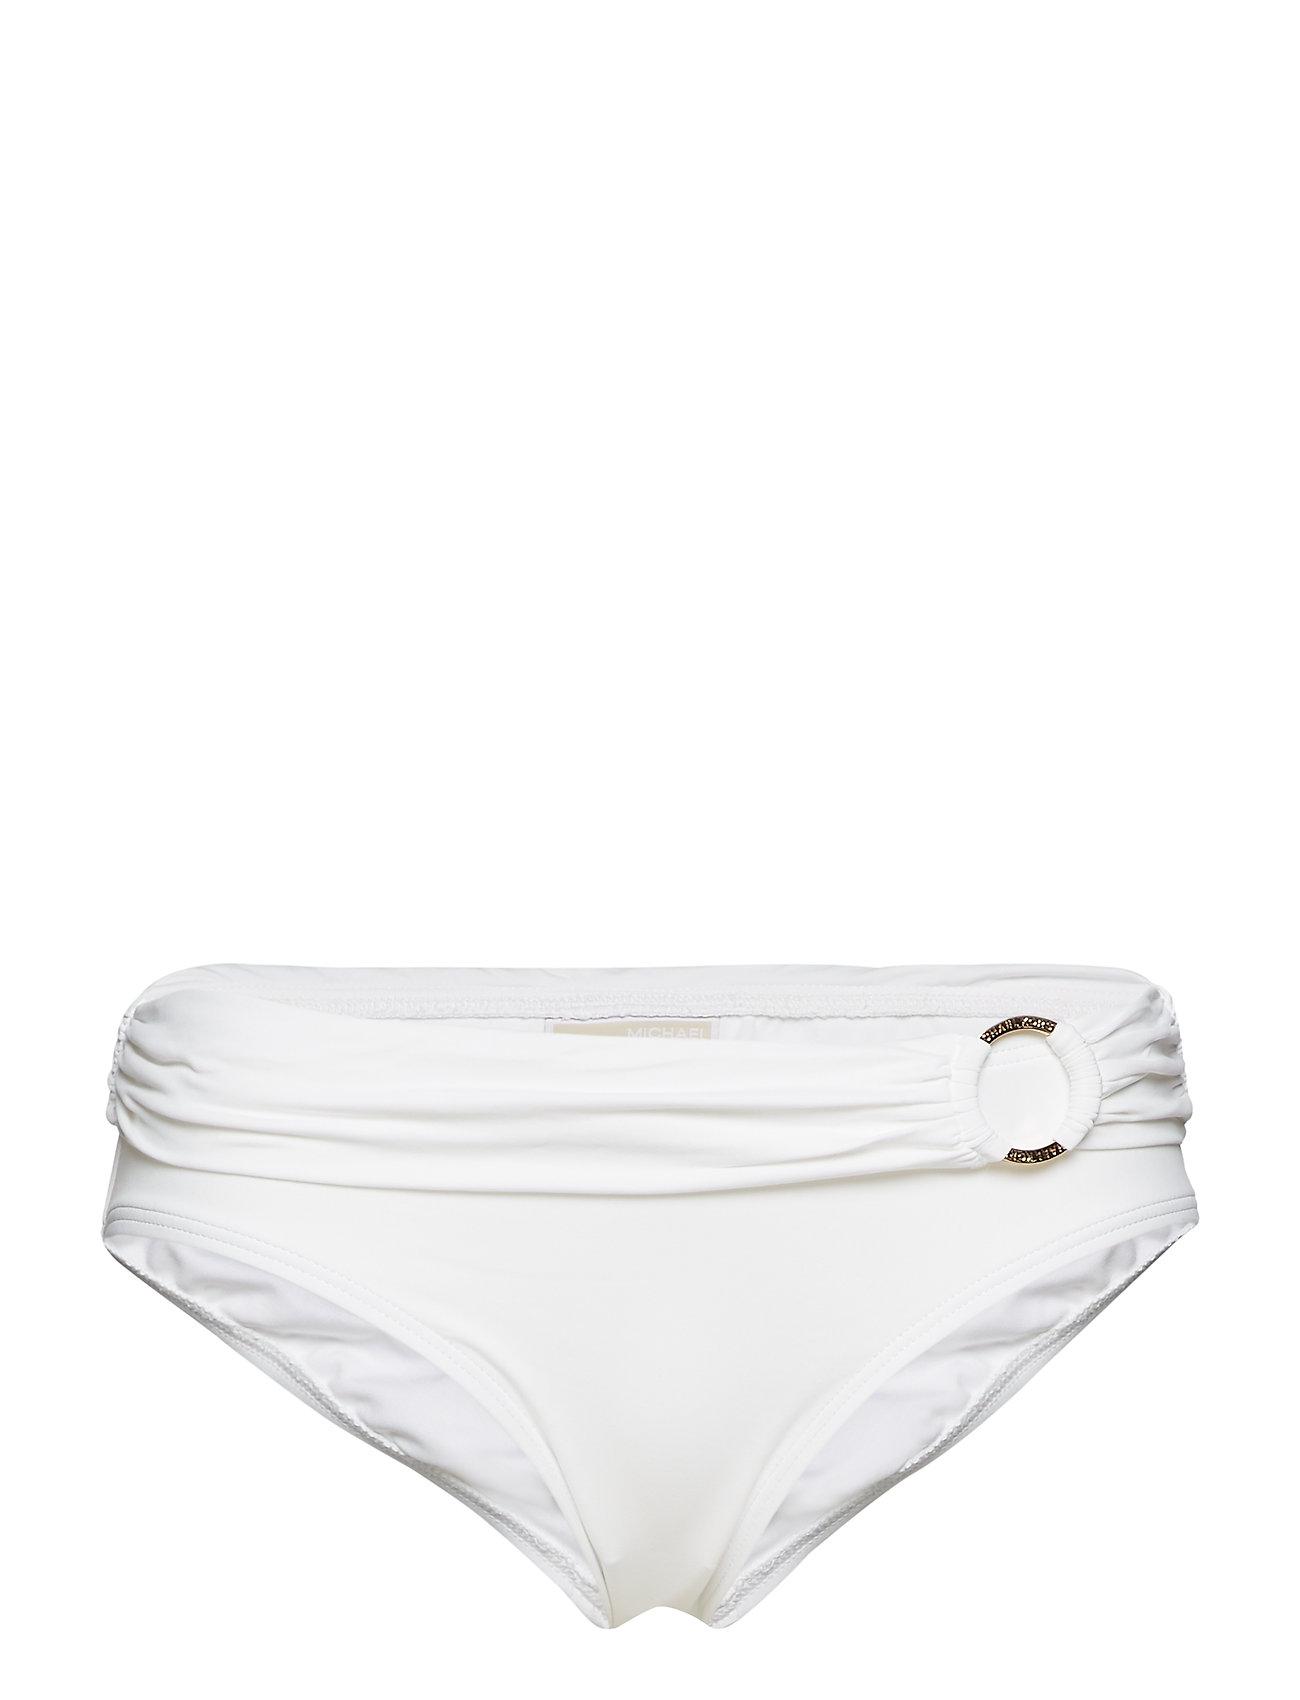 Swimwear BtmwhiteMichael Swimwear BtmwhiteMichael Bikini Swimwear Kors Kors Bikini Bikini Kors Bikini BtmwhiteMichael yN8vmOn0w